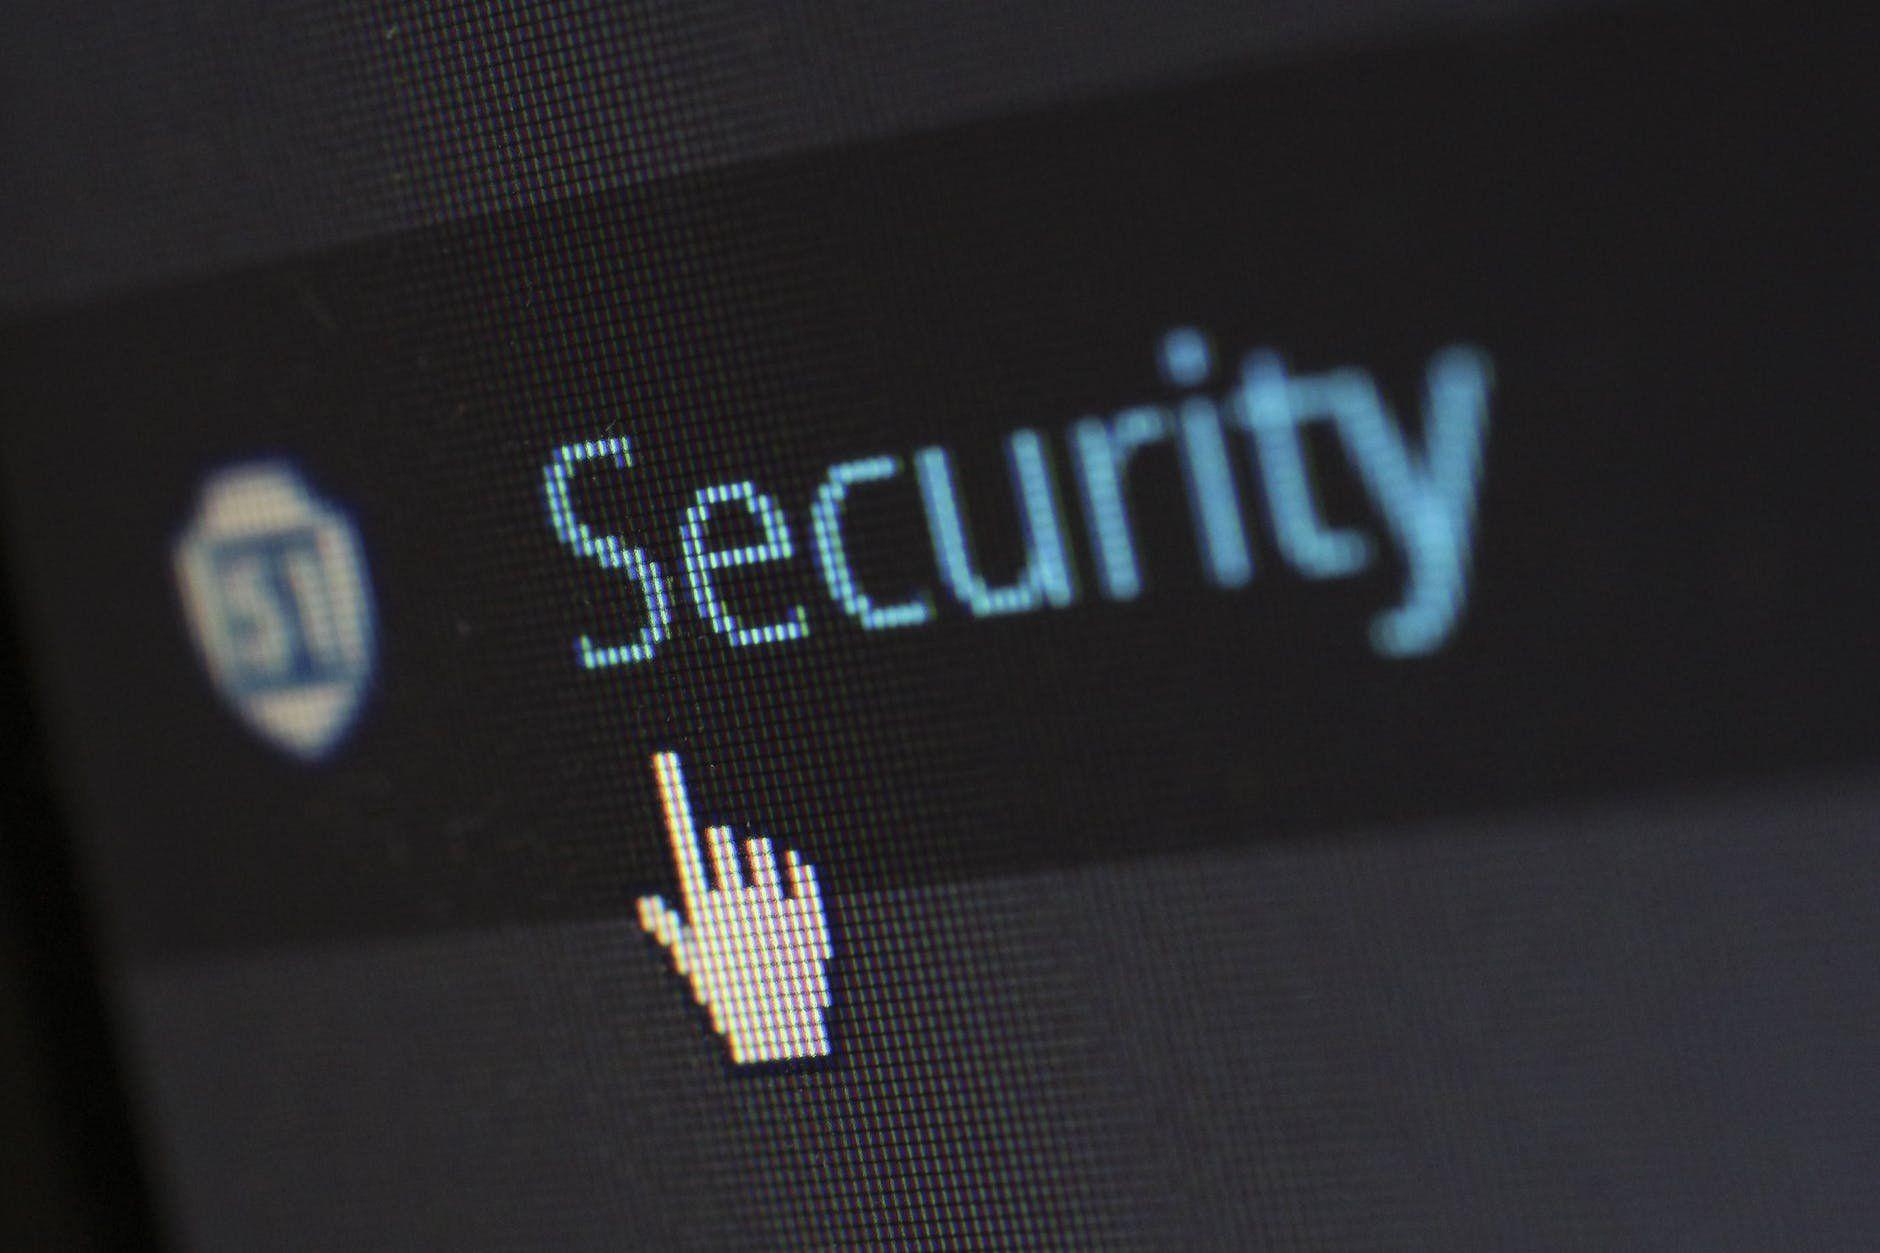 /safe-storage-hacks-vs-vulnerabilities-4g2r31s5 feature image